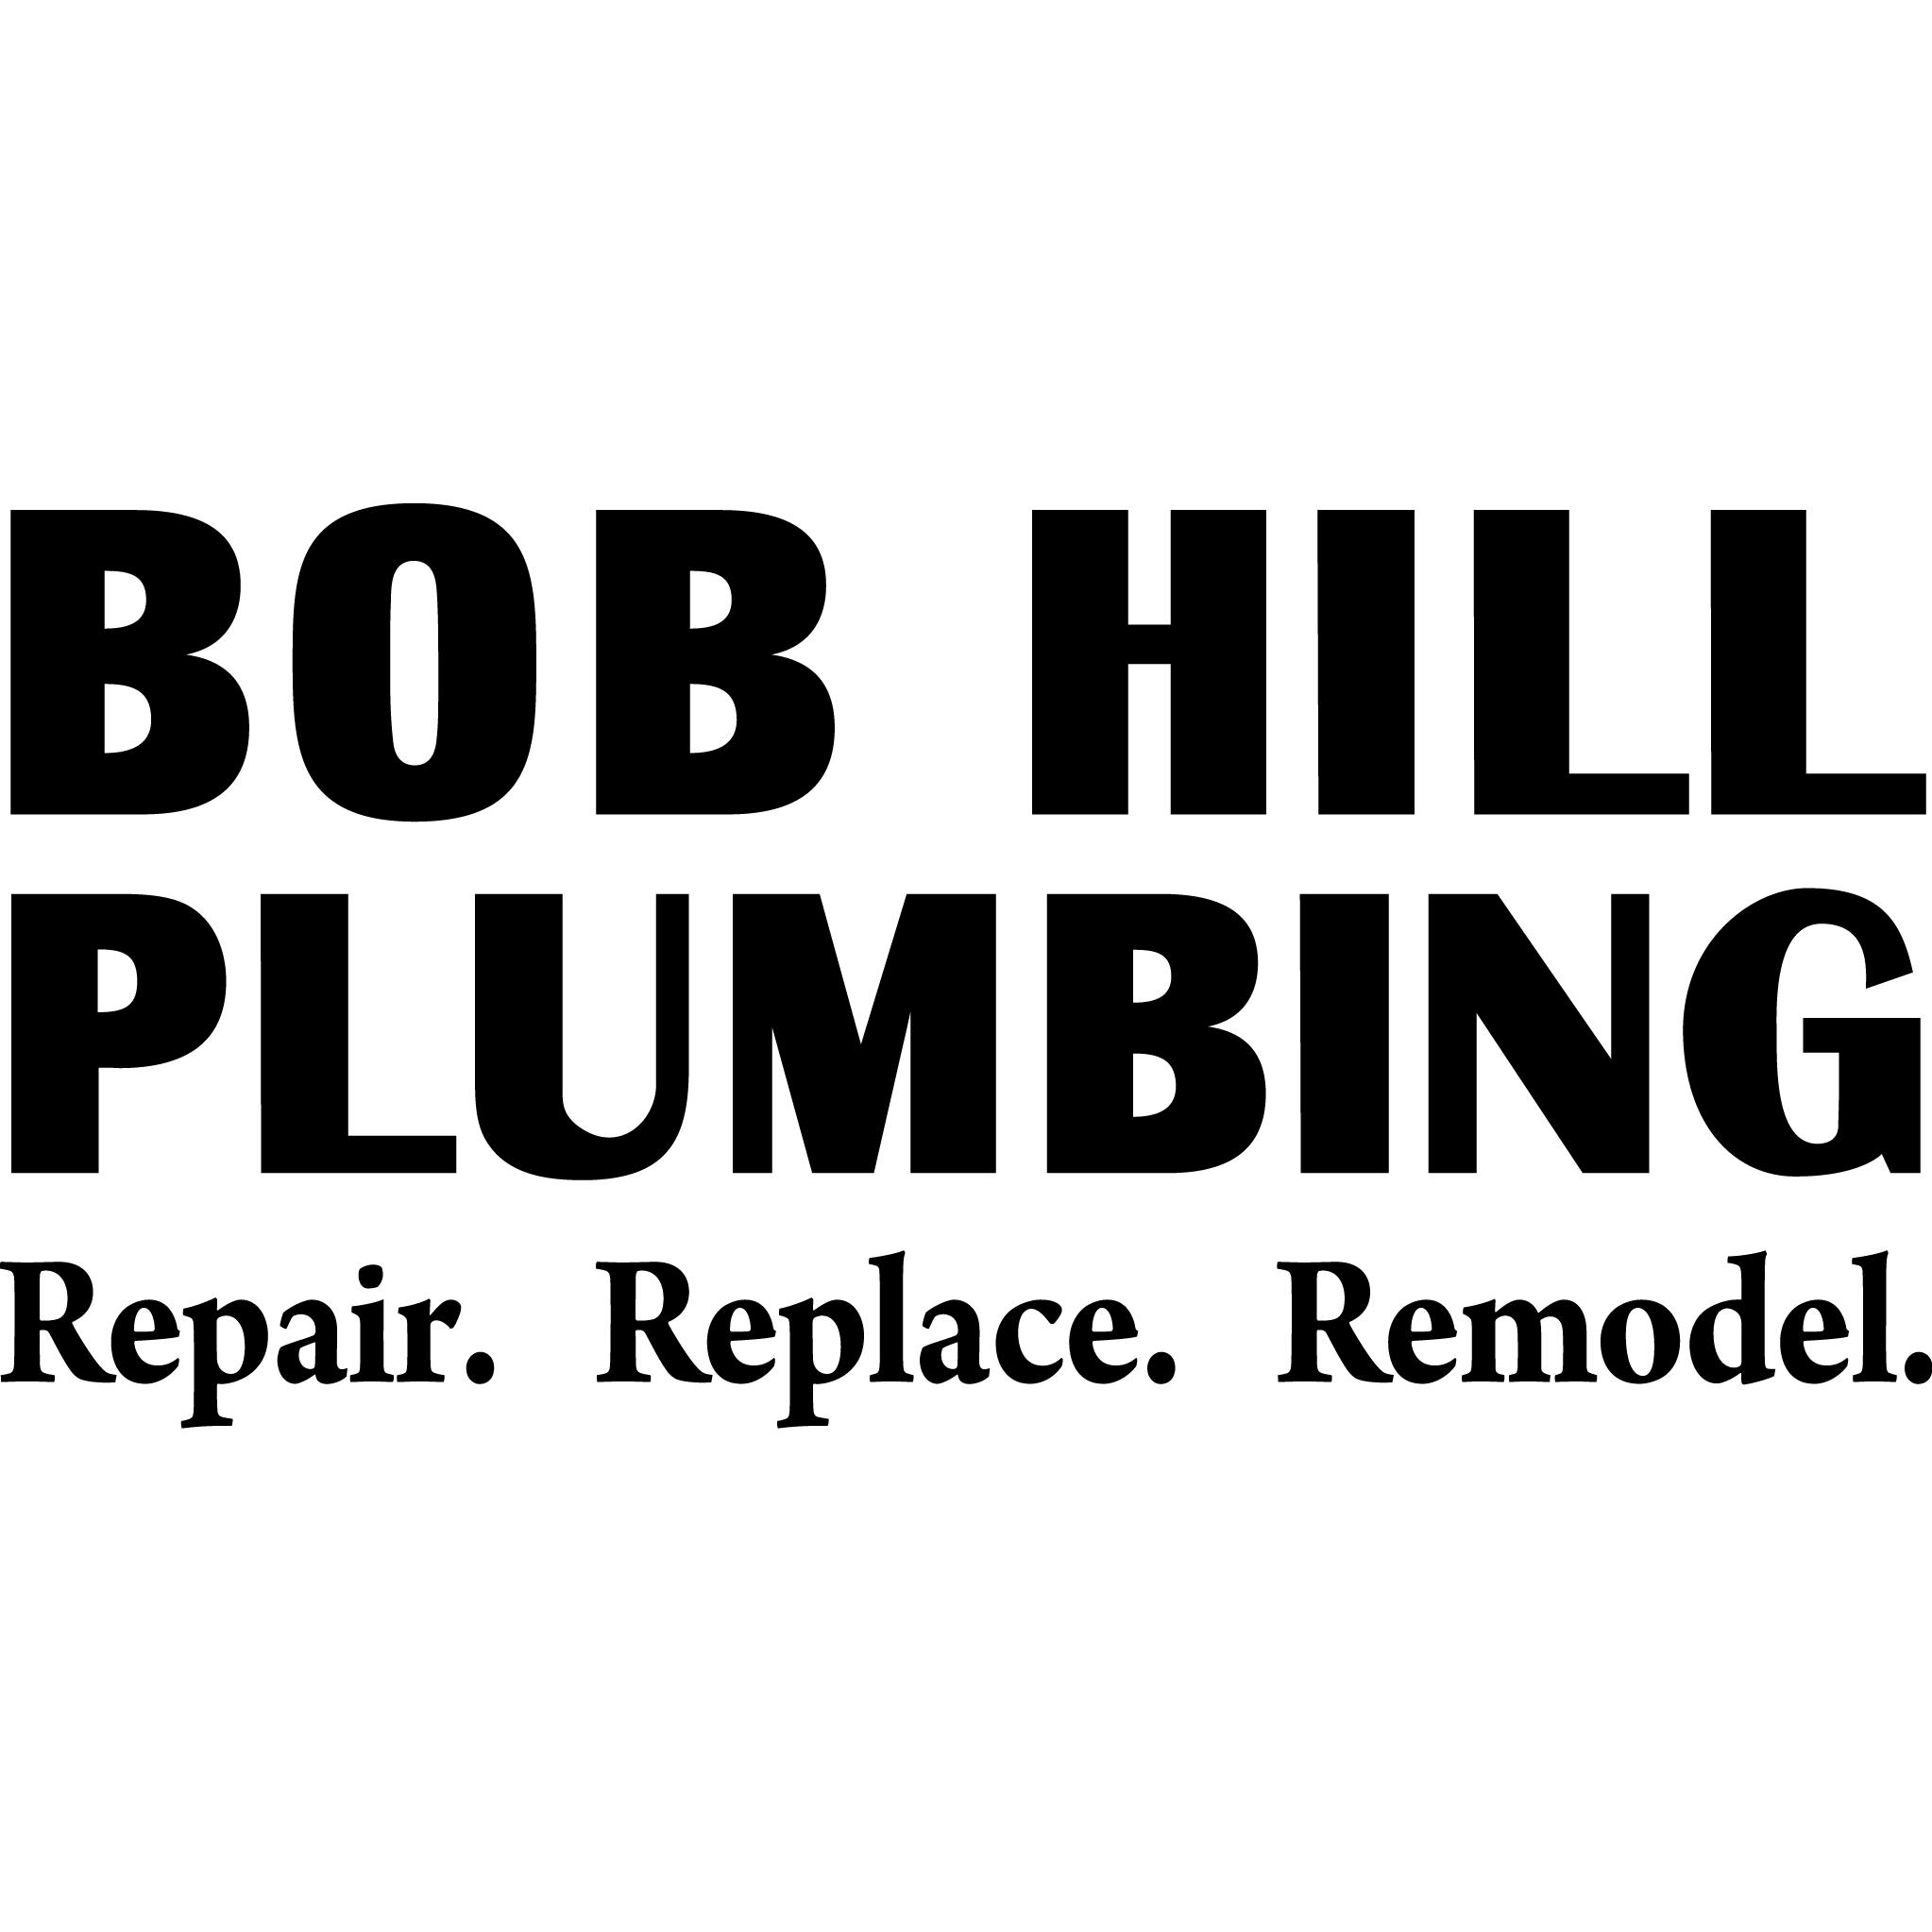 Bob Hill Plumbing